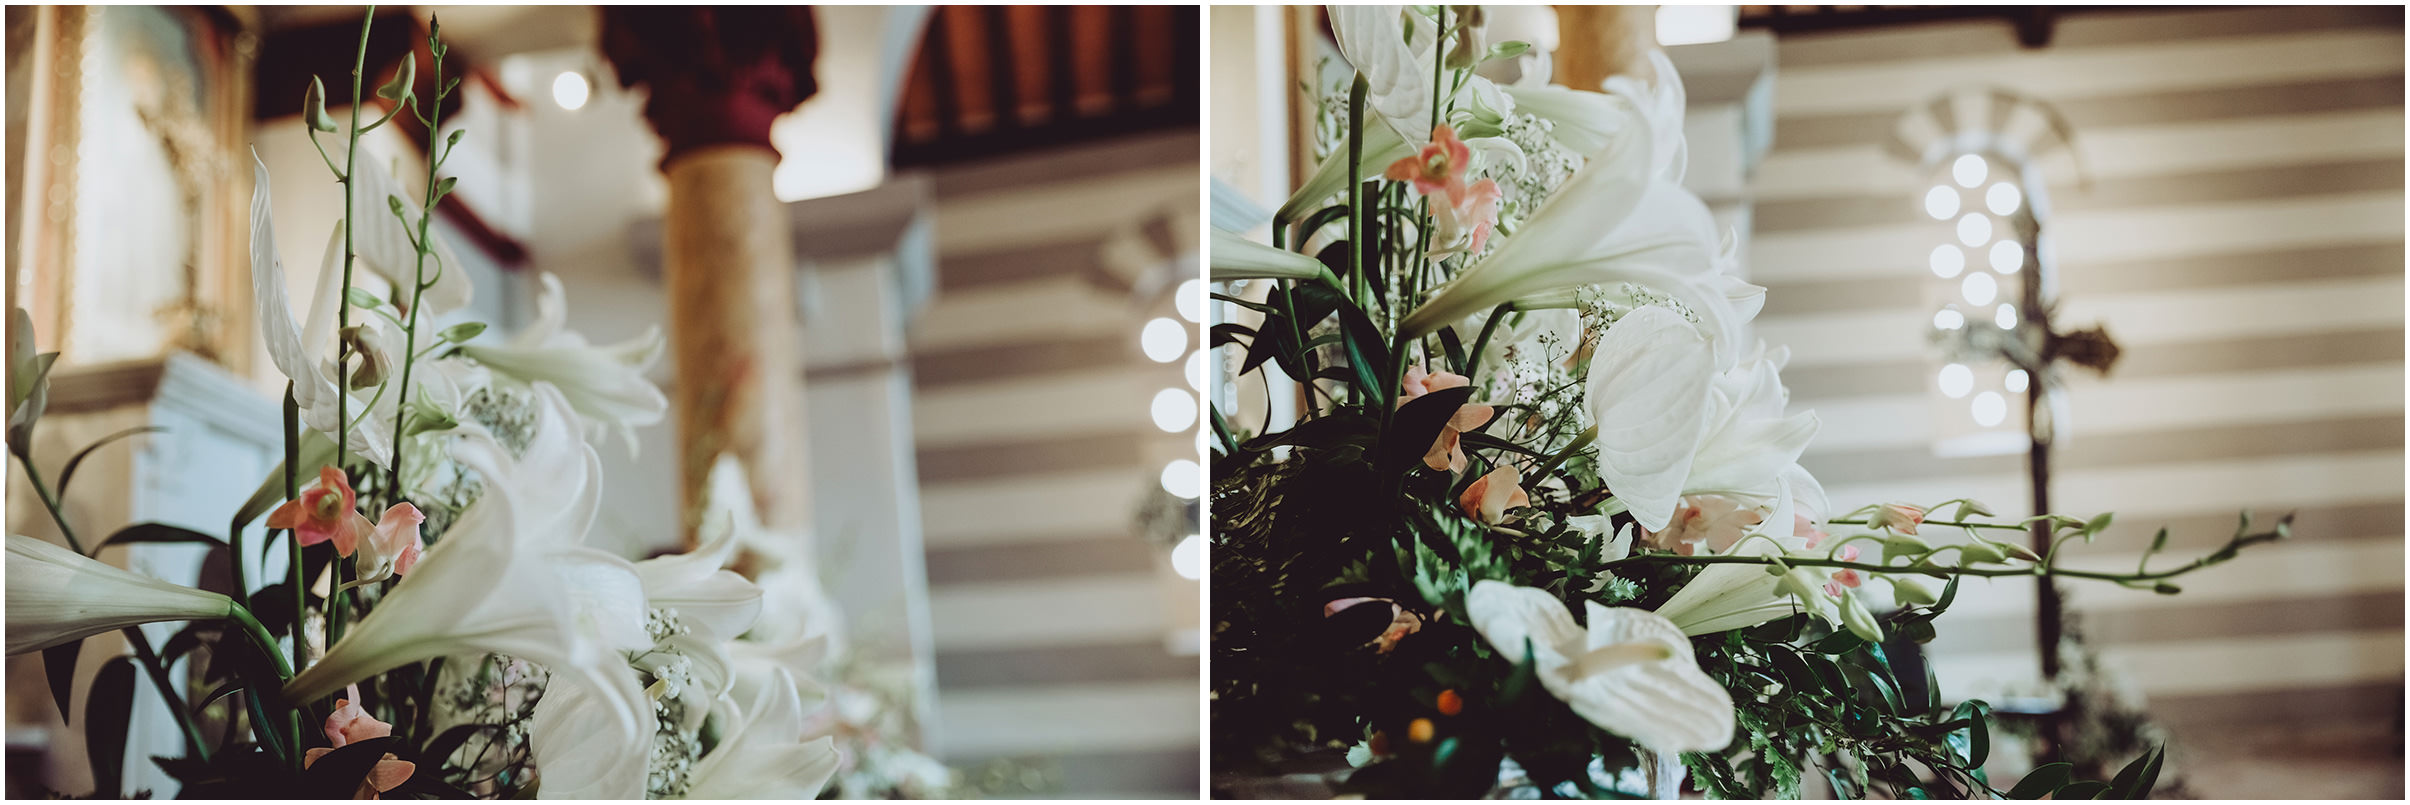 WEDDING-PHOTOGRAPHY-SARA-LORENZONI-FOTOGRAFIA-MATRIMONIO-ORVIETO-JUKA-ANTONELLO10